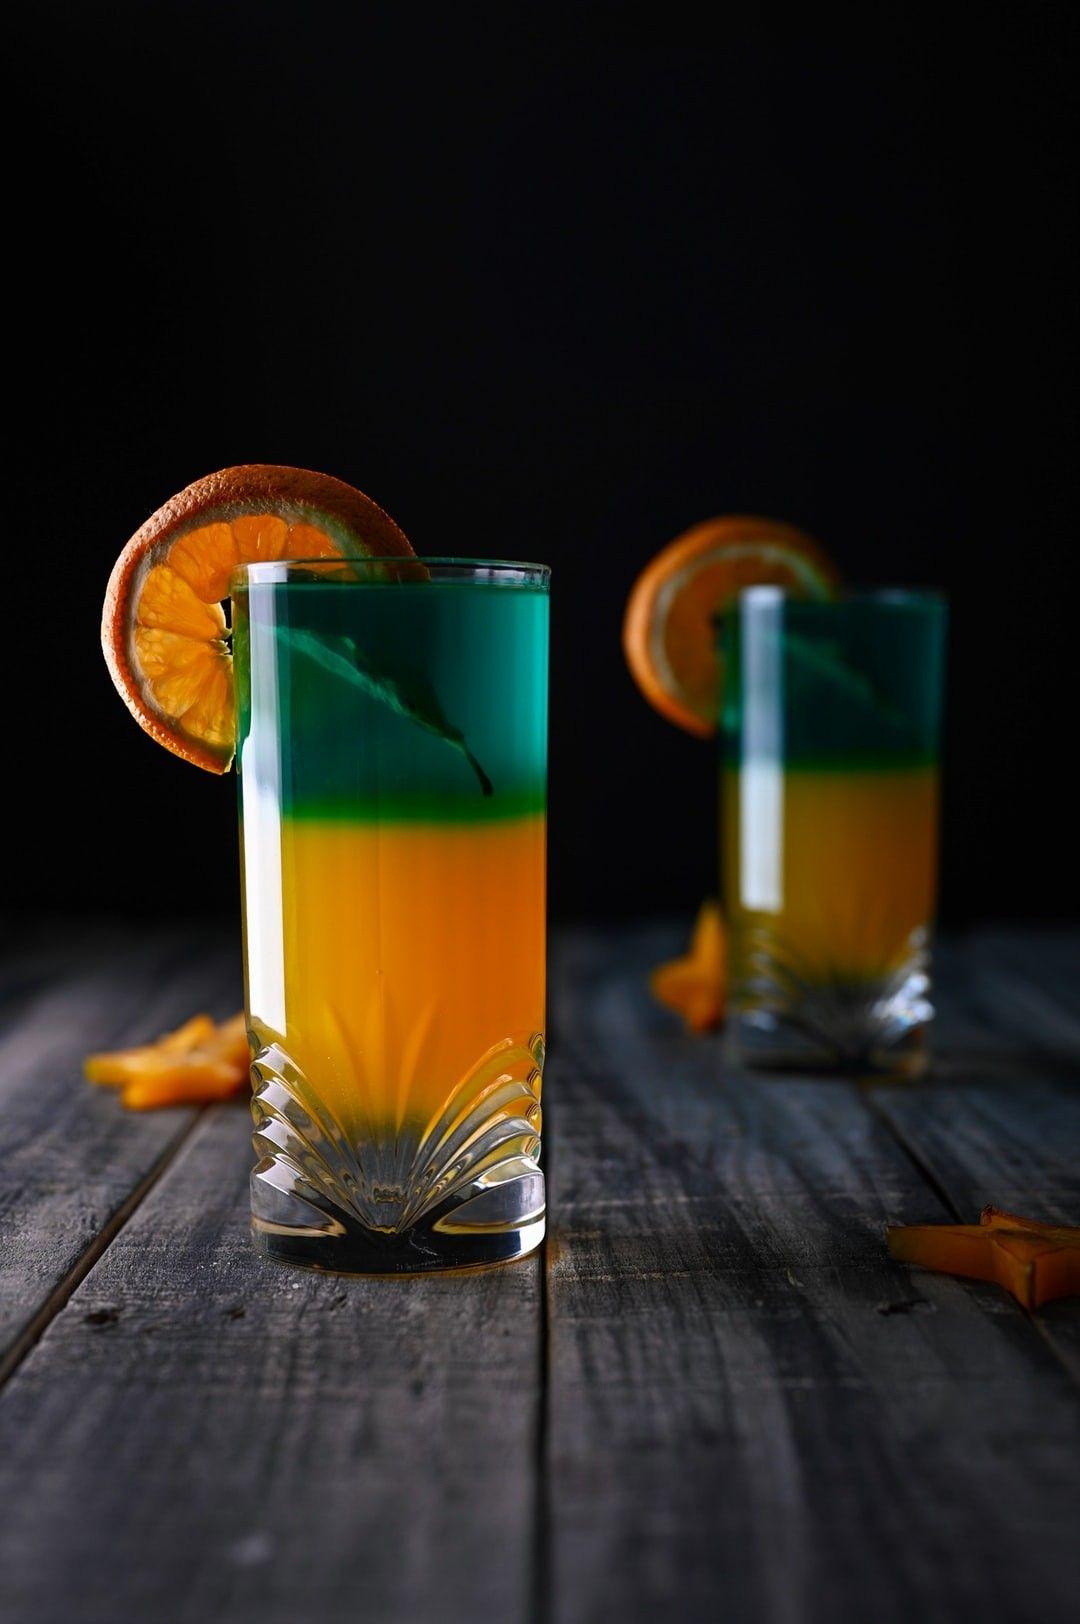 Orange Juice With Sliced Orange On Tip Of Glass Hd